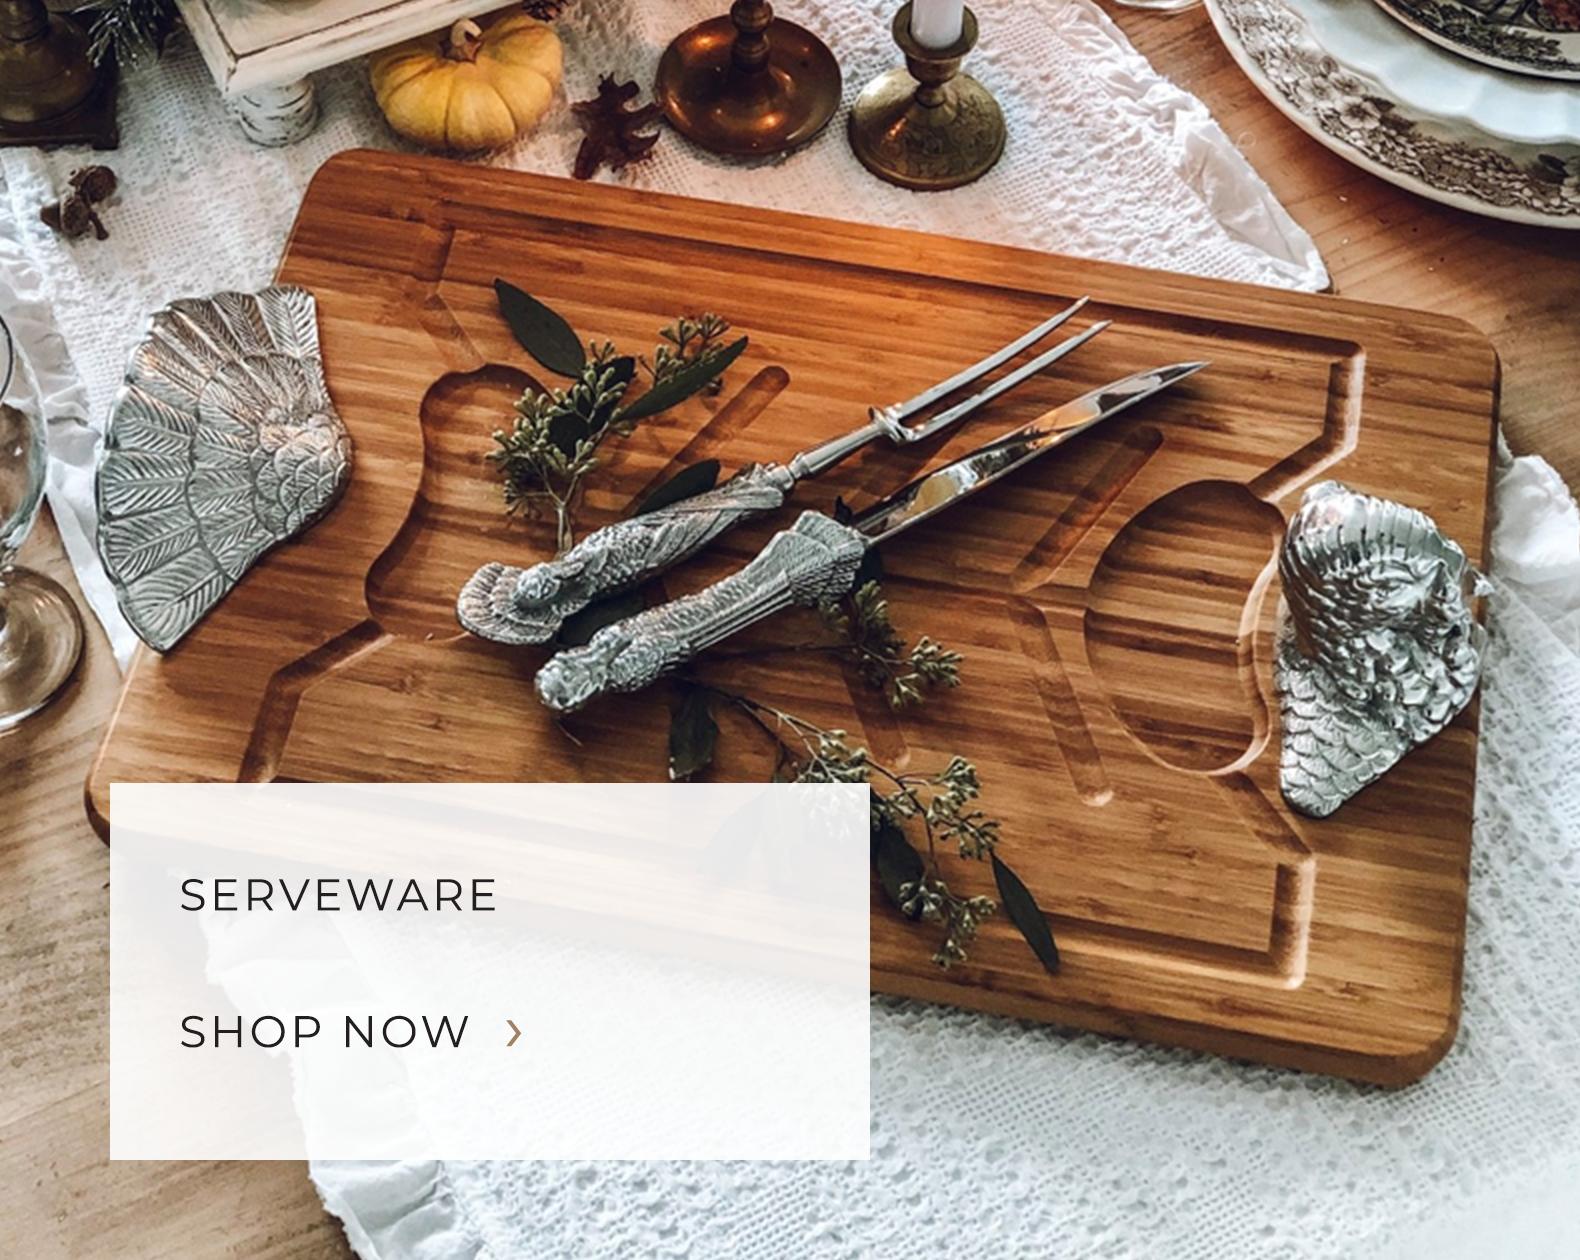 serveware